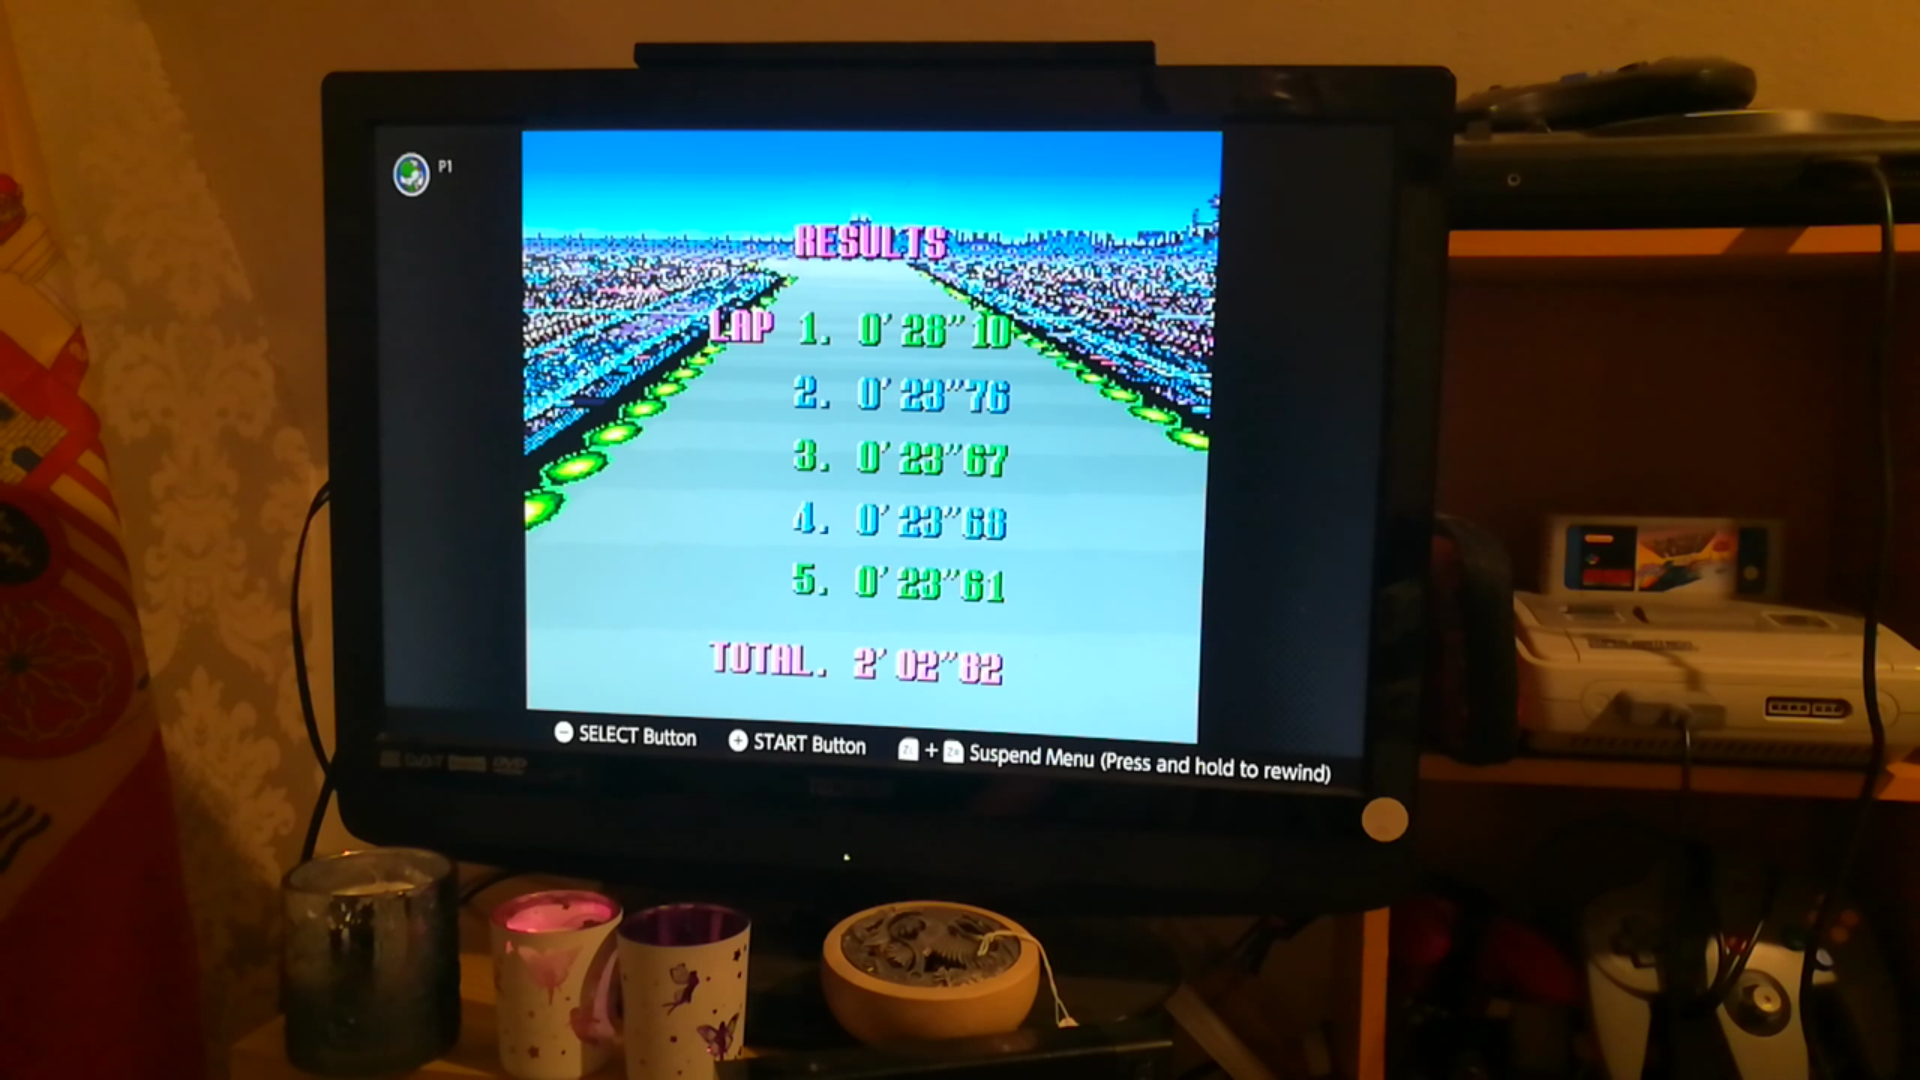 Mimitchi: F-Zero: Practice [No Rival]: Mute City I (SNES/Super Famicom Emulated) 0:02:02.82 points on 2020-03-08 21:31:10